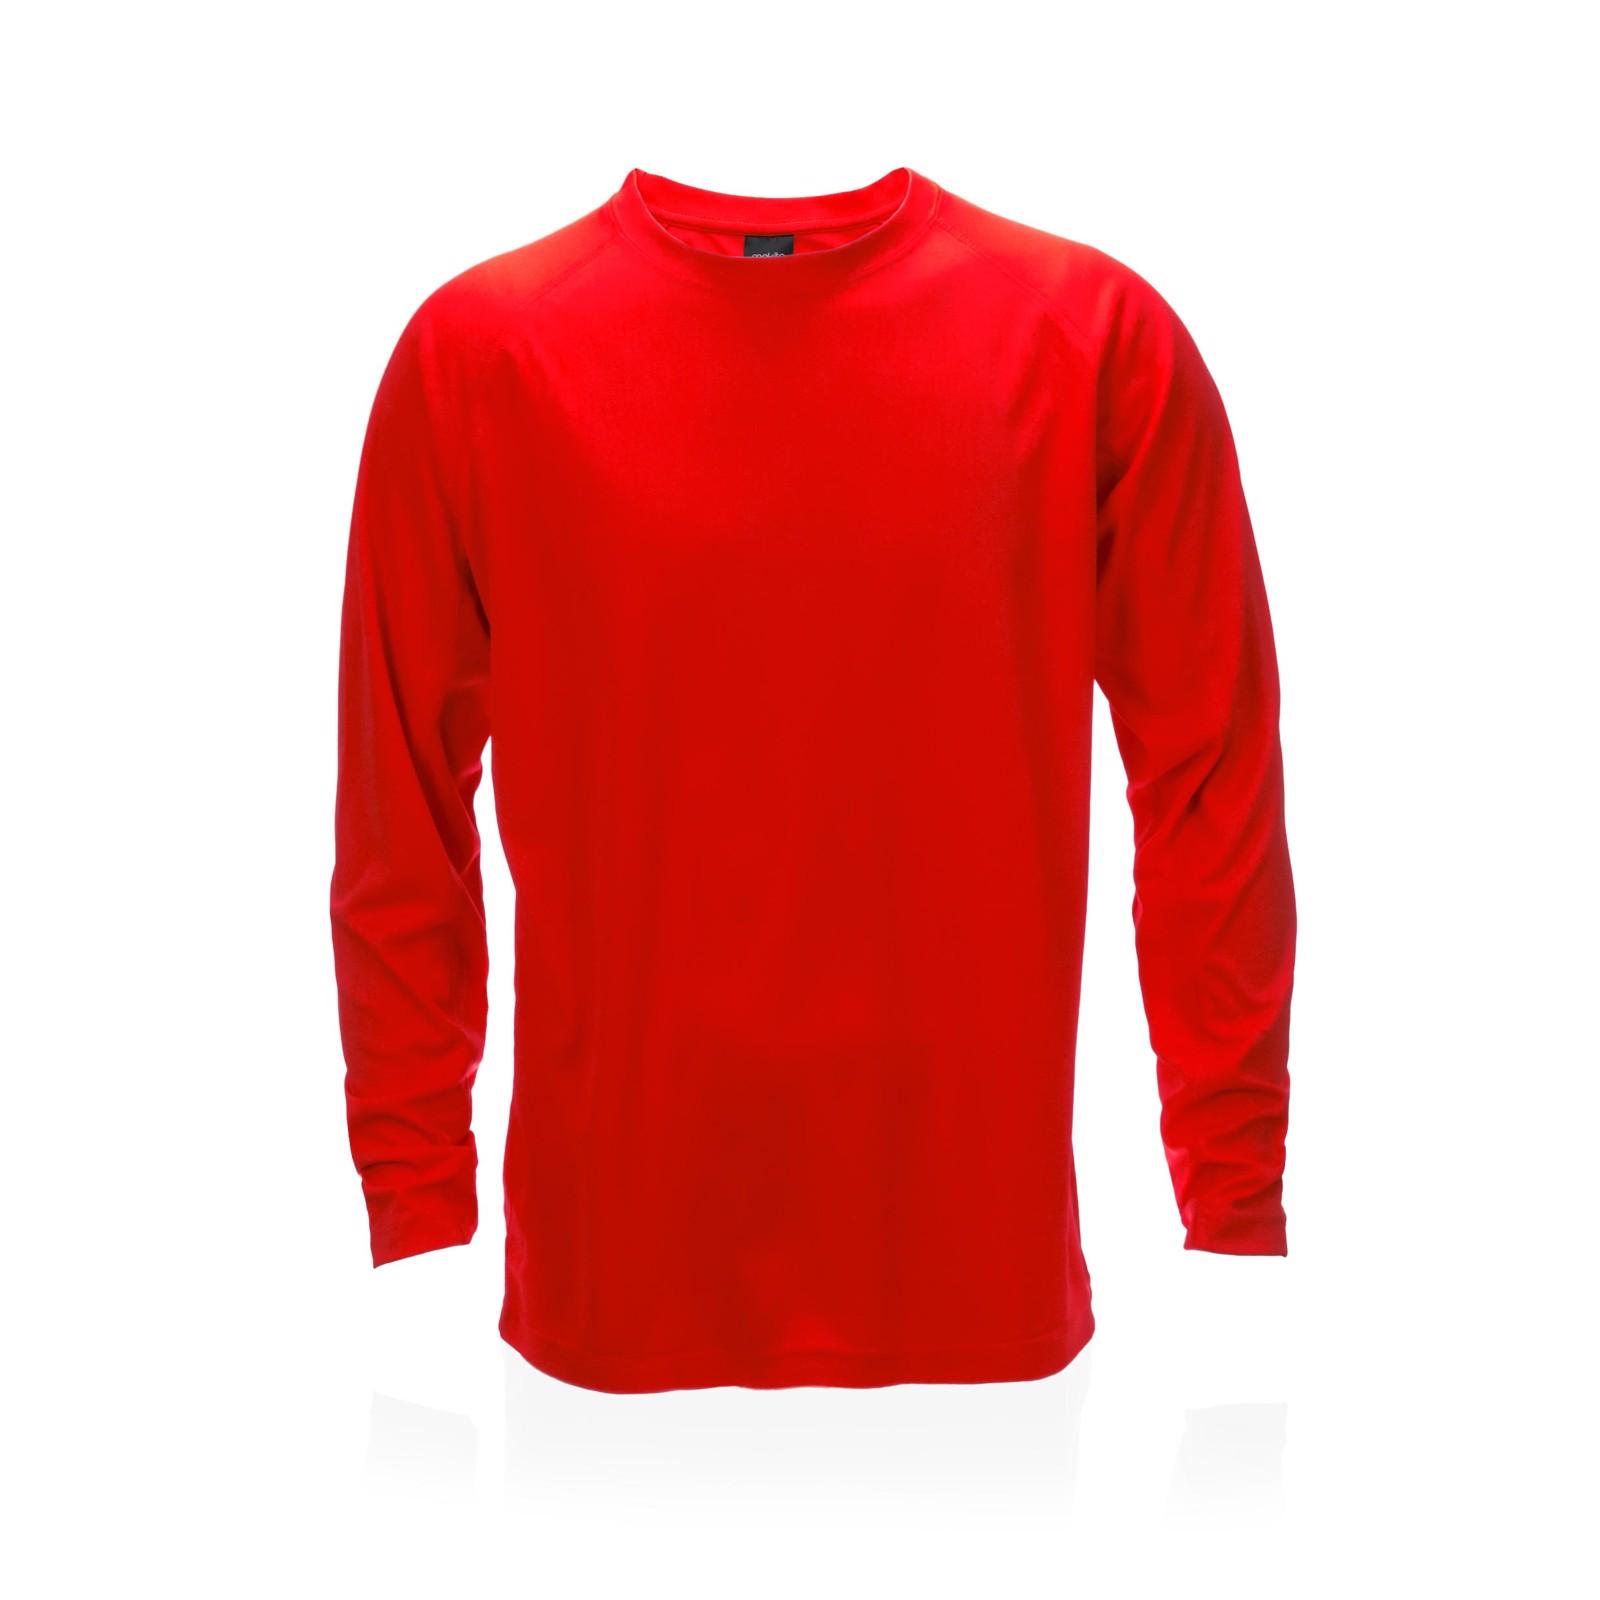 Camiseta Adulto Tecnik Maik - Rojo / XL